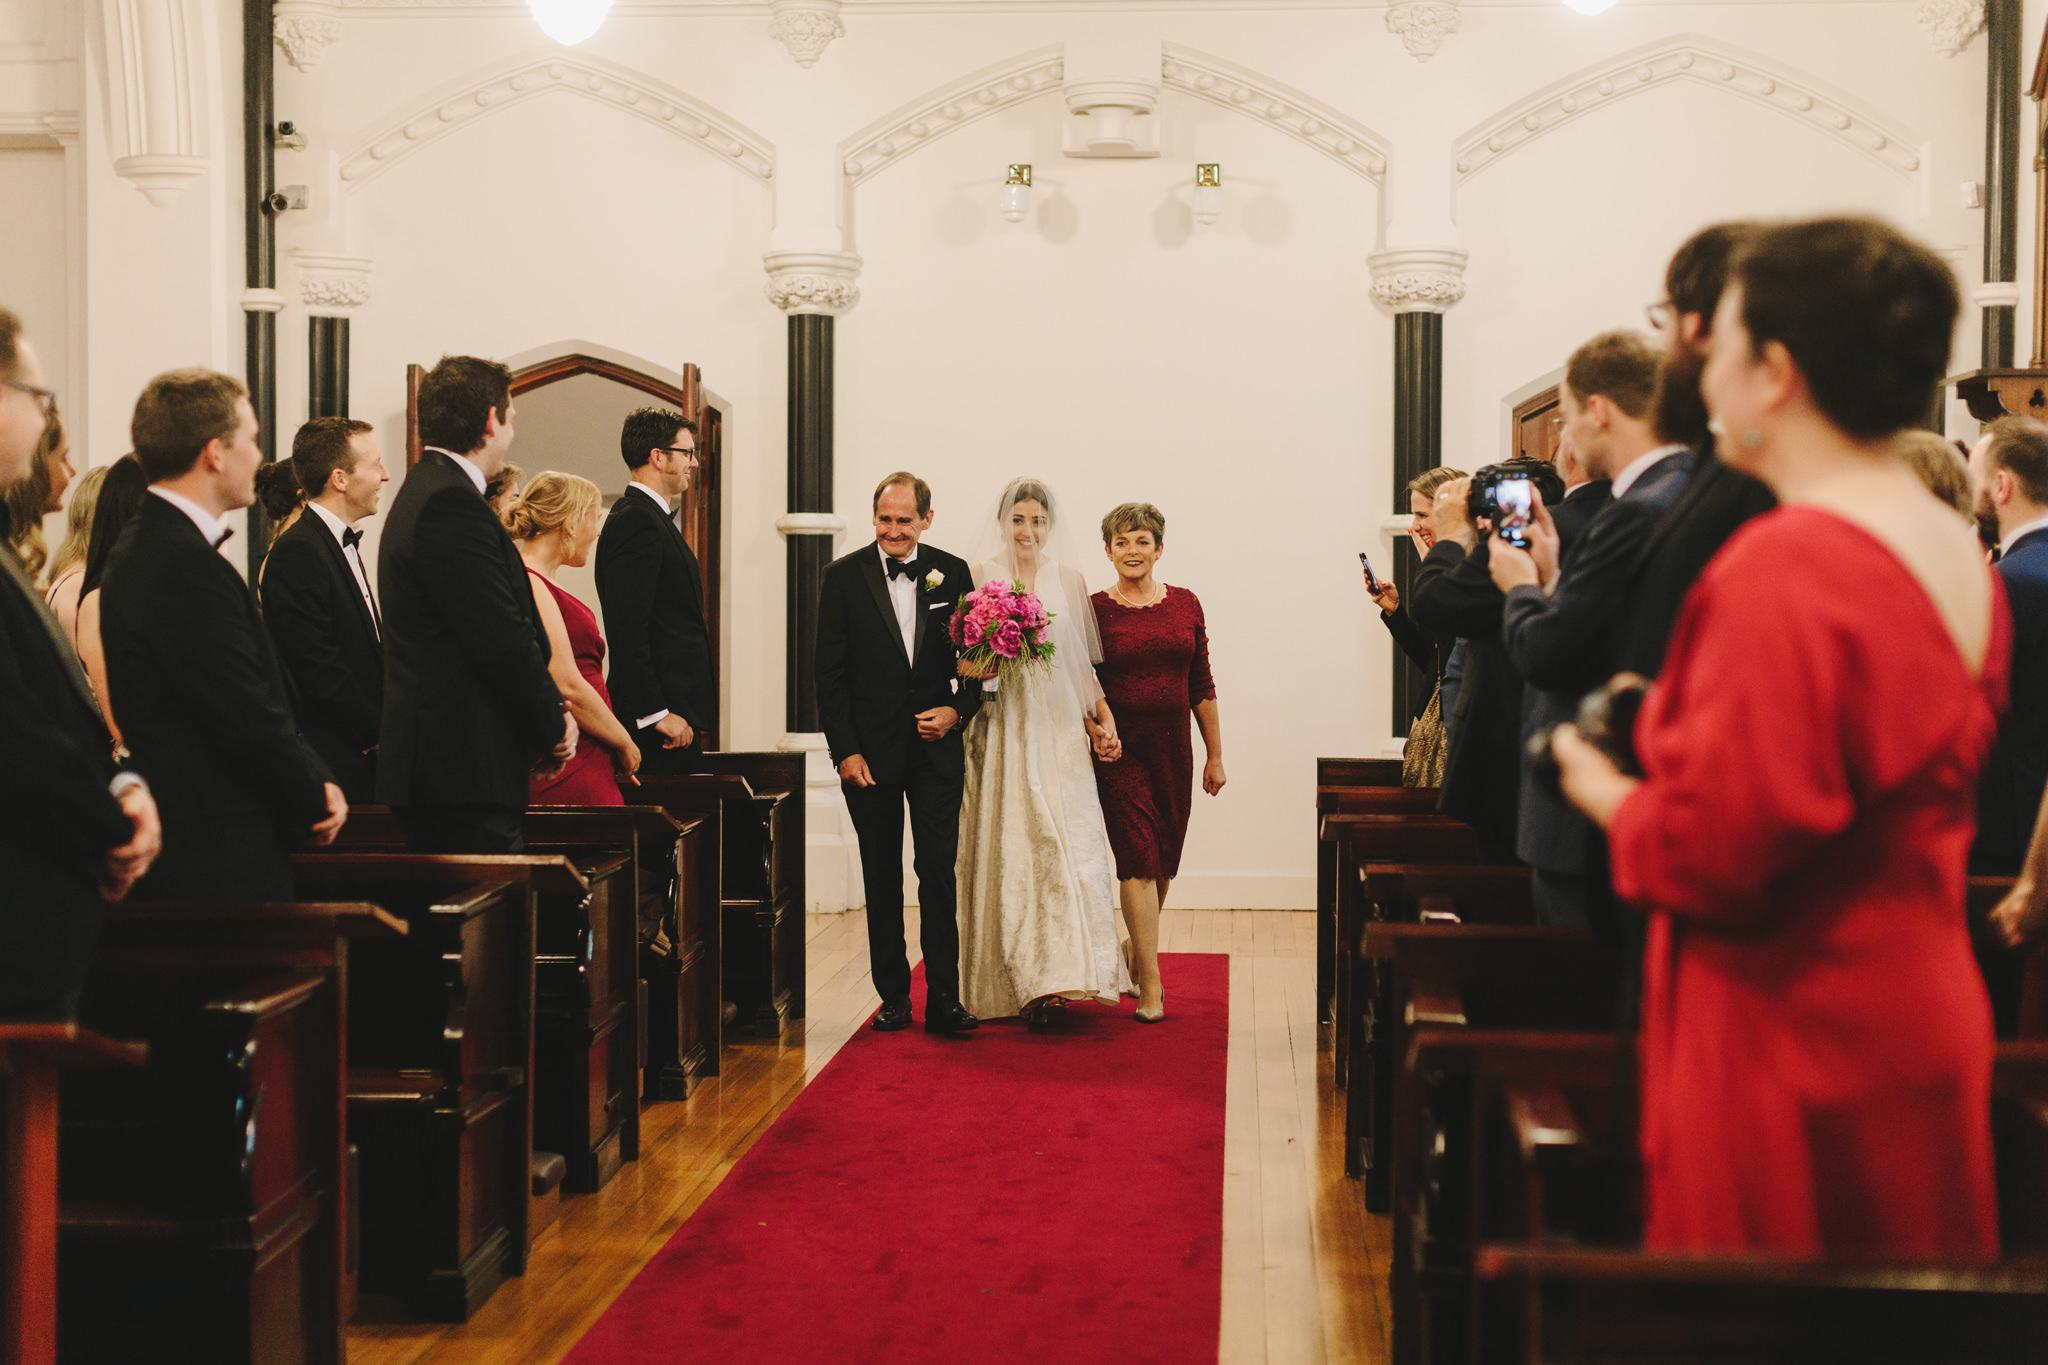 Abbotsford_Convent_Wedding_Peter_Anna048.JPG